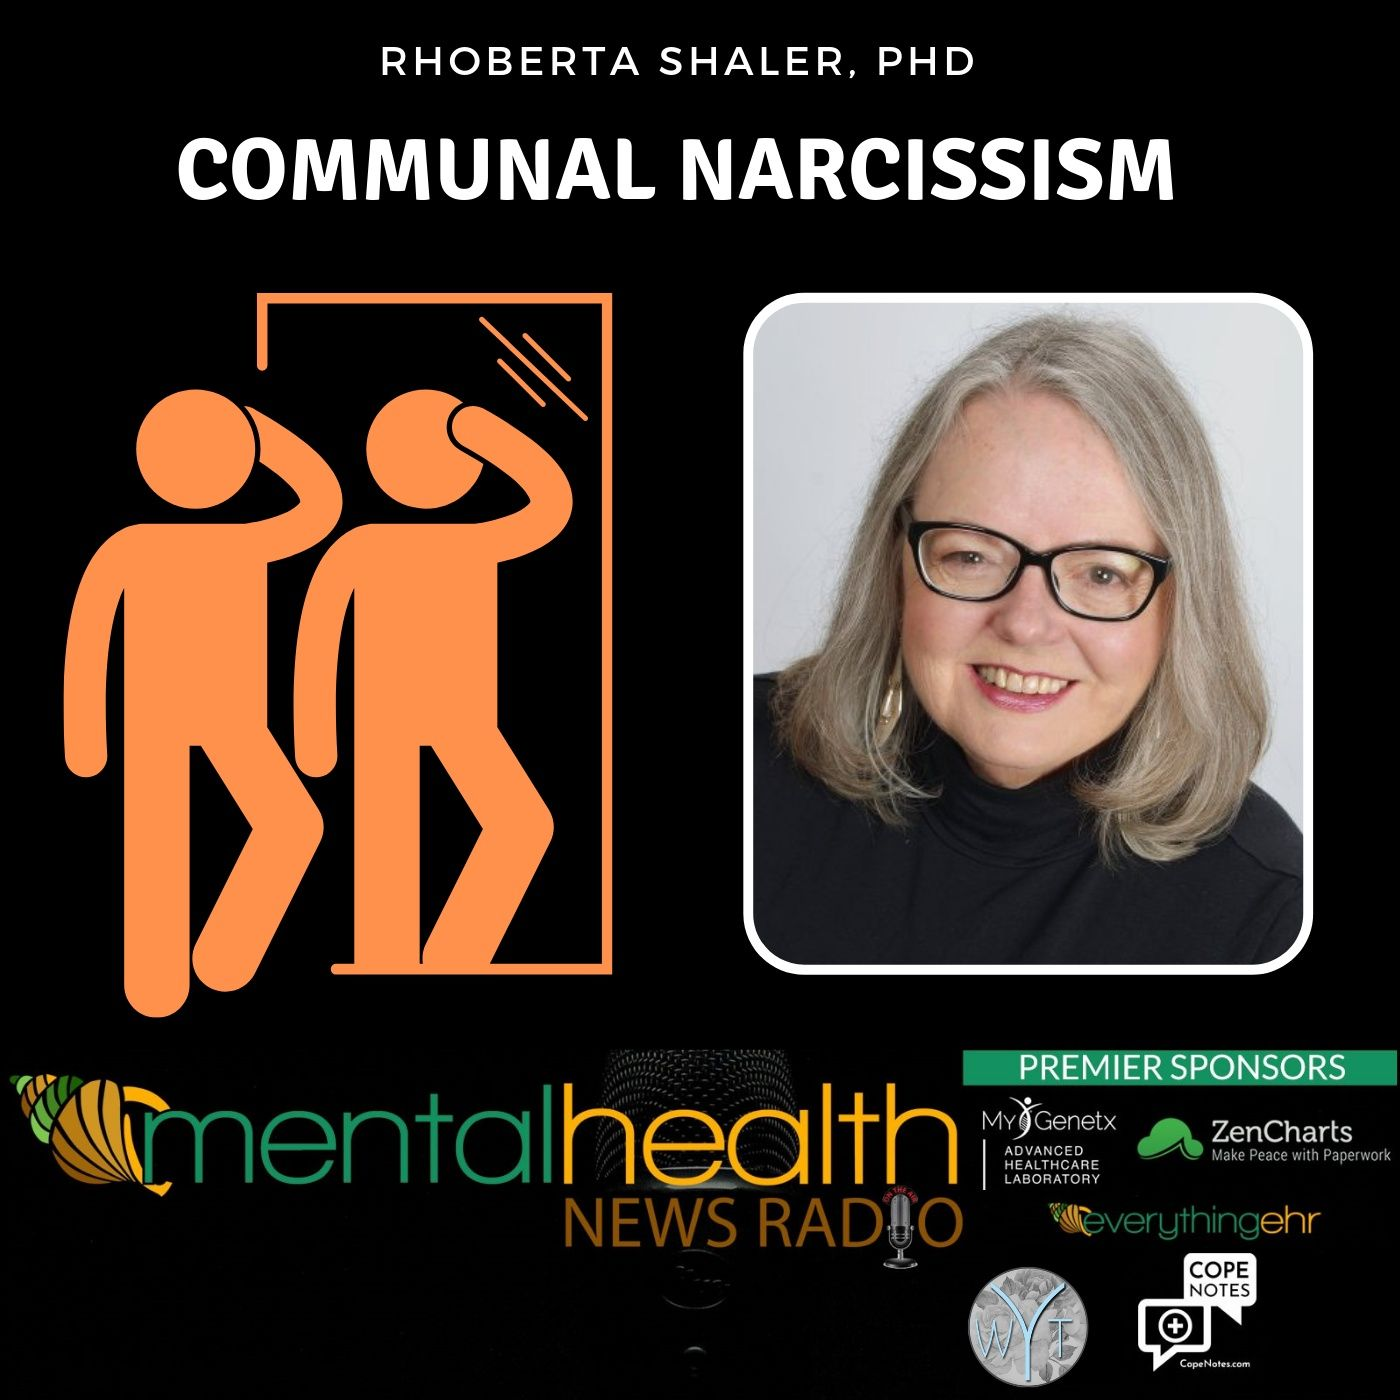 Mental Health News Radio - Communal Narcissism with Dr. Rhoberta Shaler